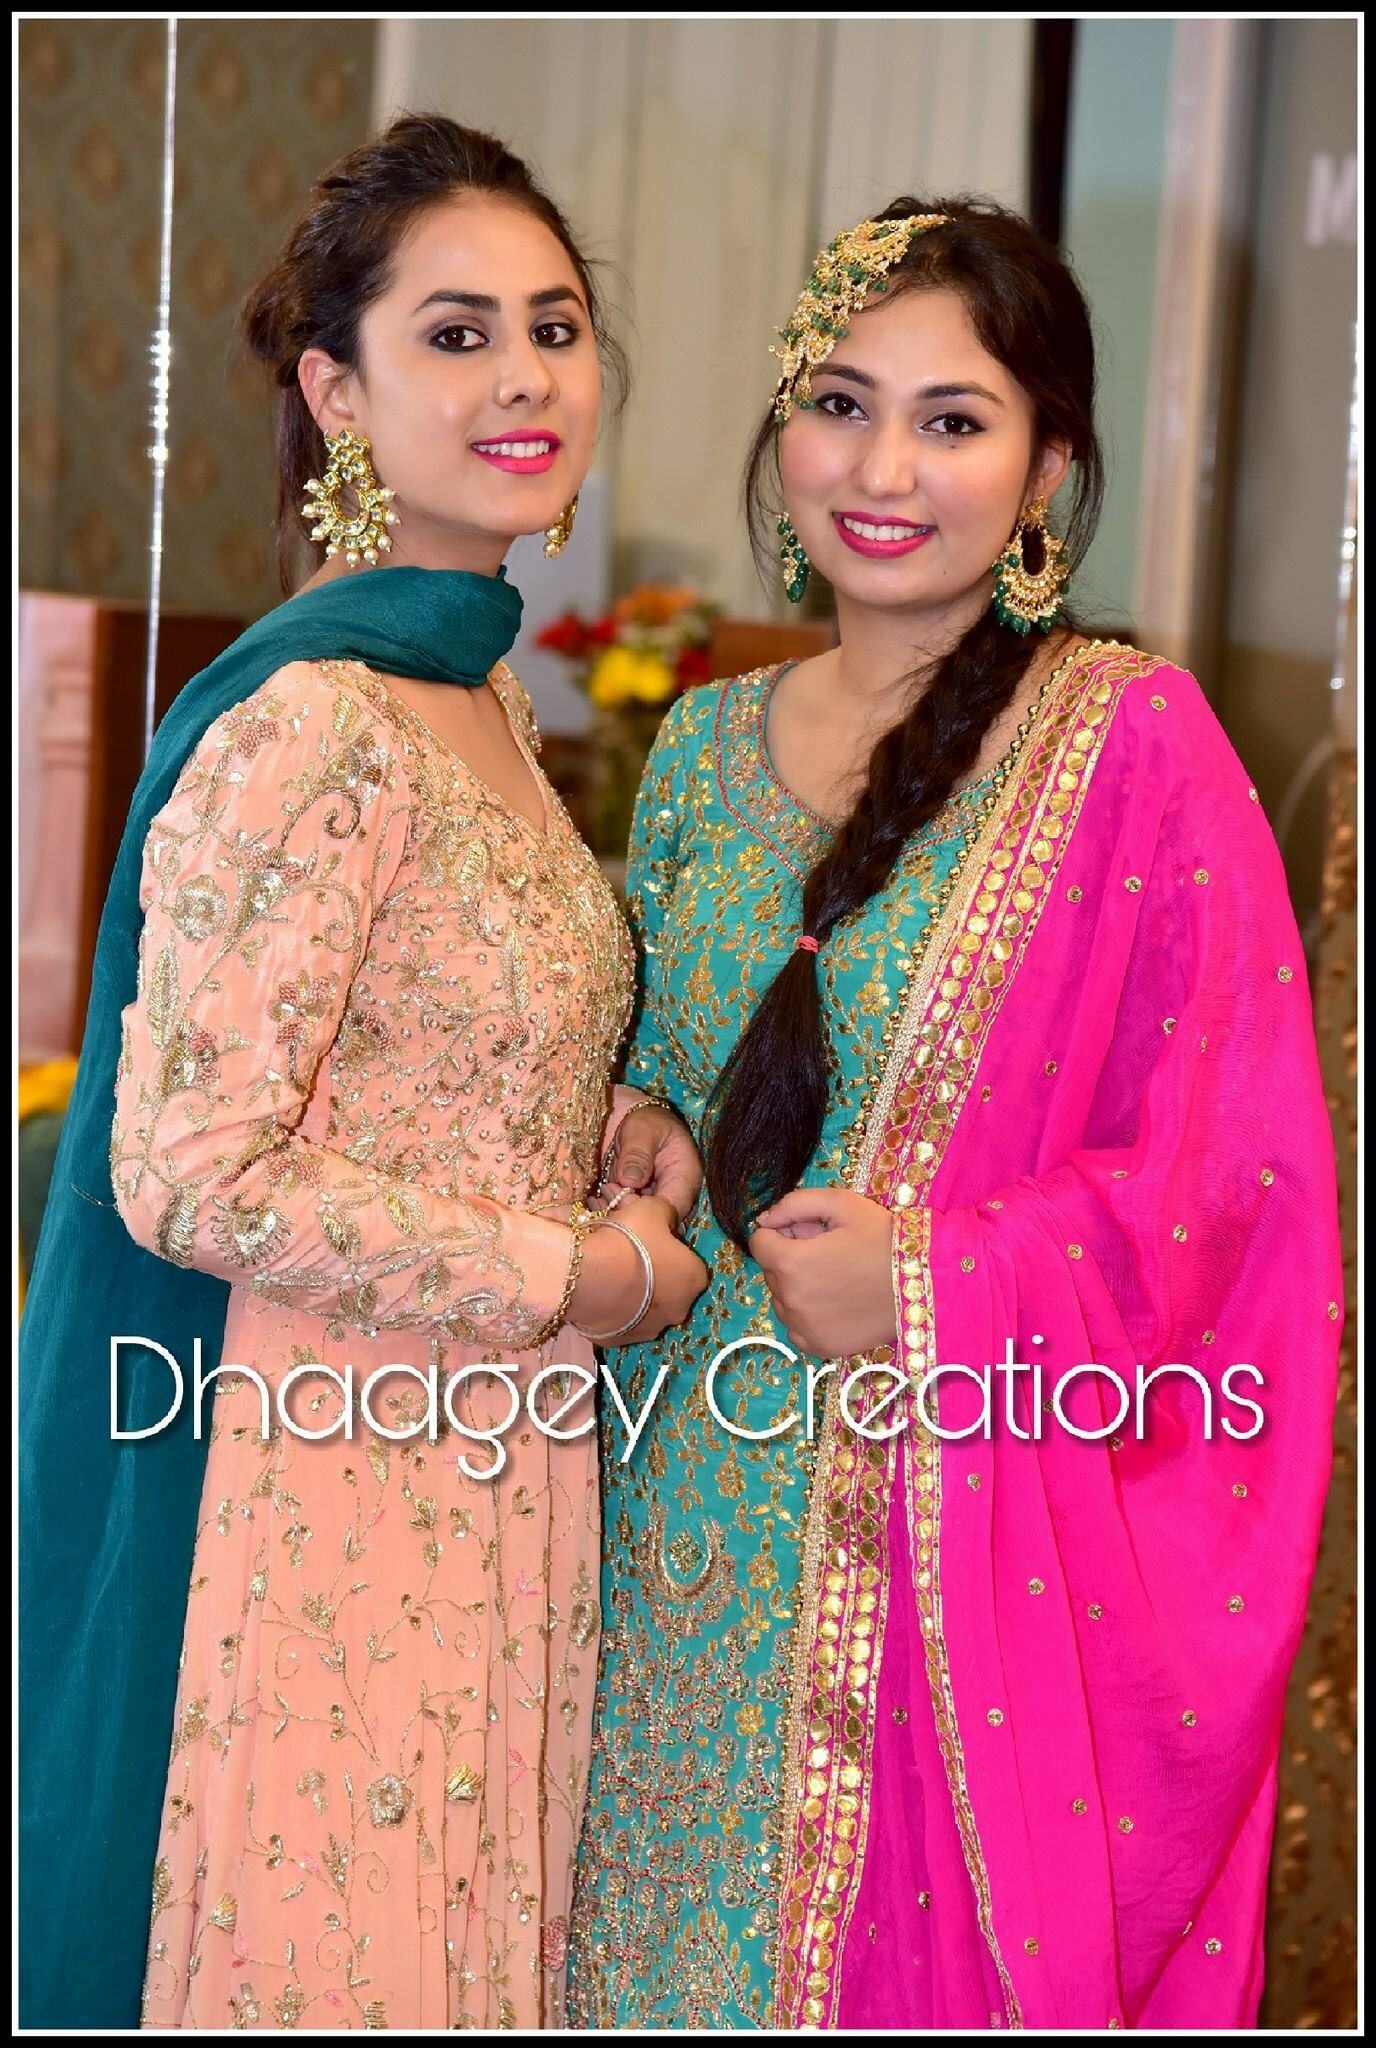 8186954a7a Patiala suit salwar suits kameez kurti designer punjabi indian also  manidrehar desinger in rh pinterest